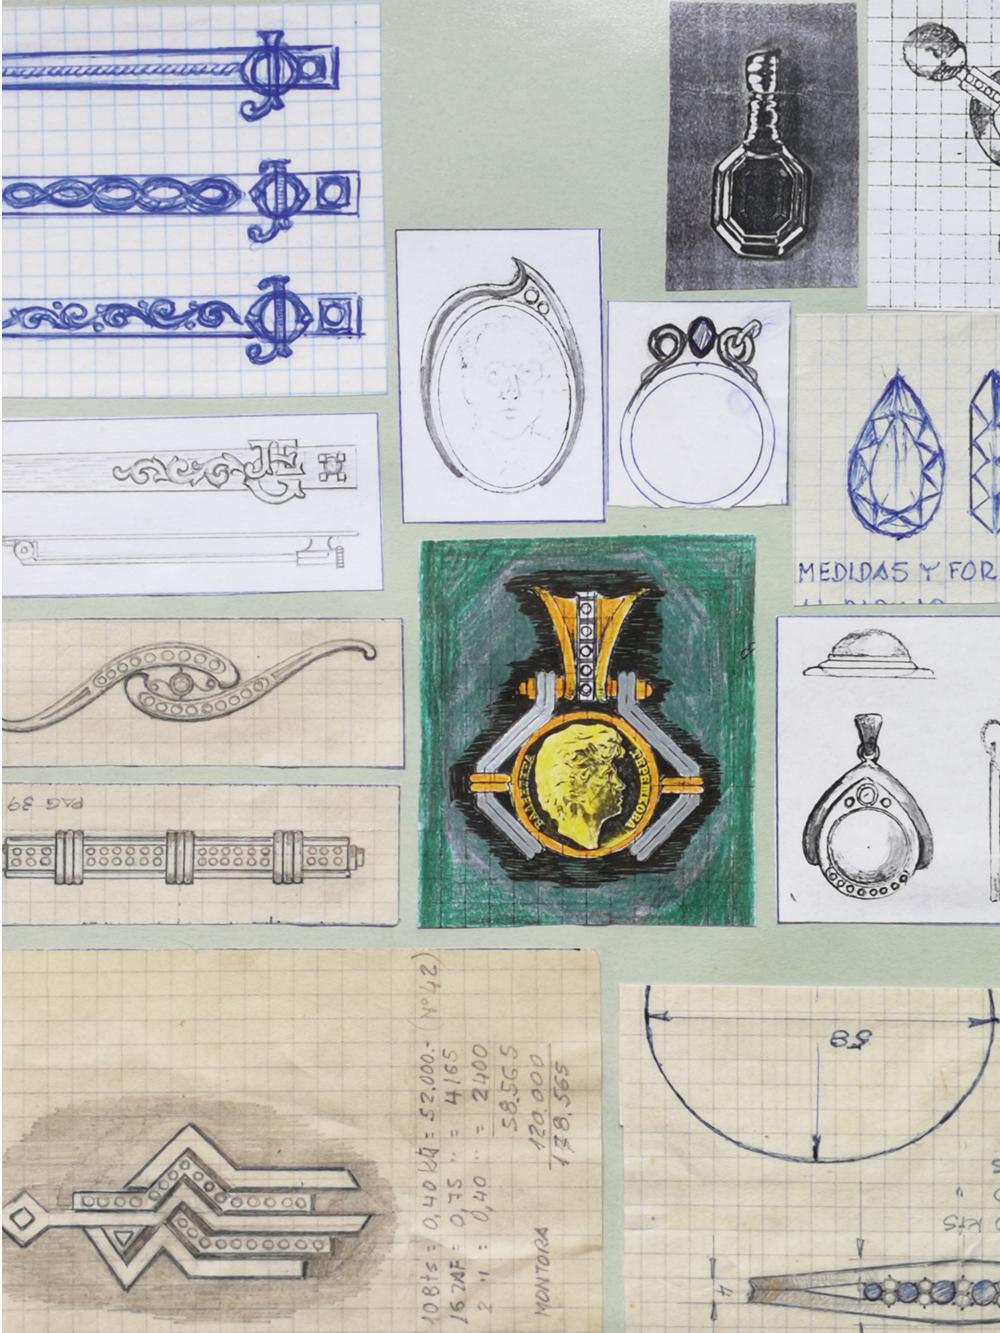 Estudio de iniciales I. Jose Kareaga